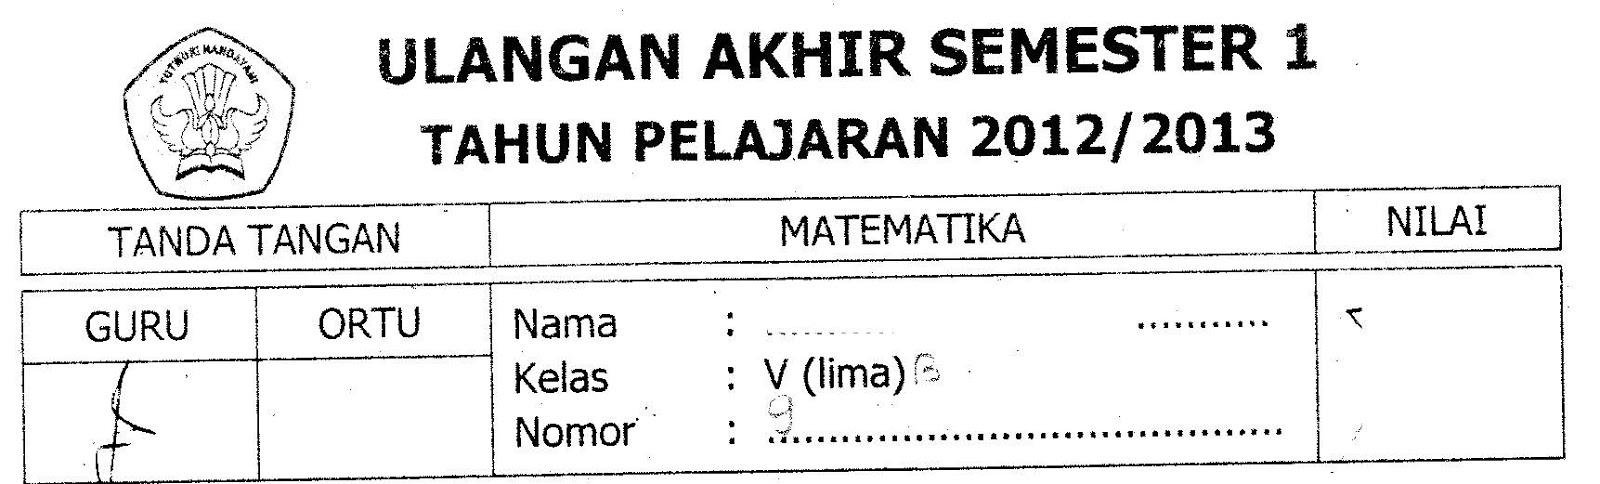 Uas Matik Semester1 Kelas5 Ta2012 2013 Sunarto S Kom